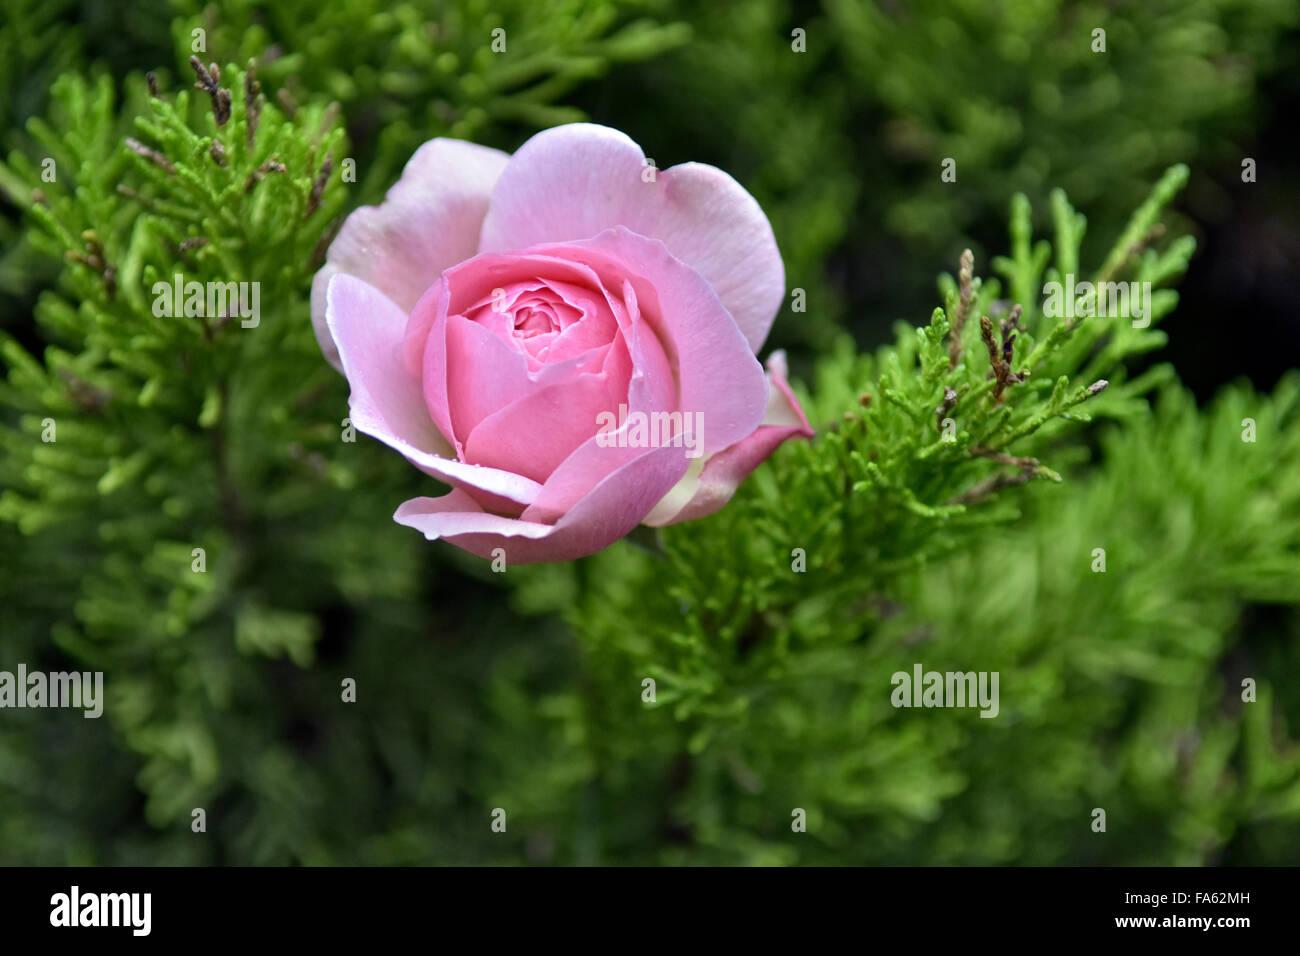 Bristol, UK. 22nd Dec, 2015. Pink rose still flowering in an unusually warm December winter.  Taken 22nd December, - Stock Image